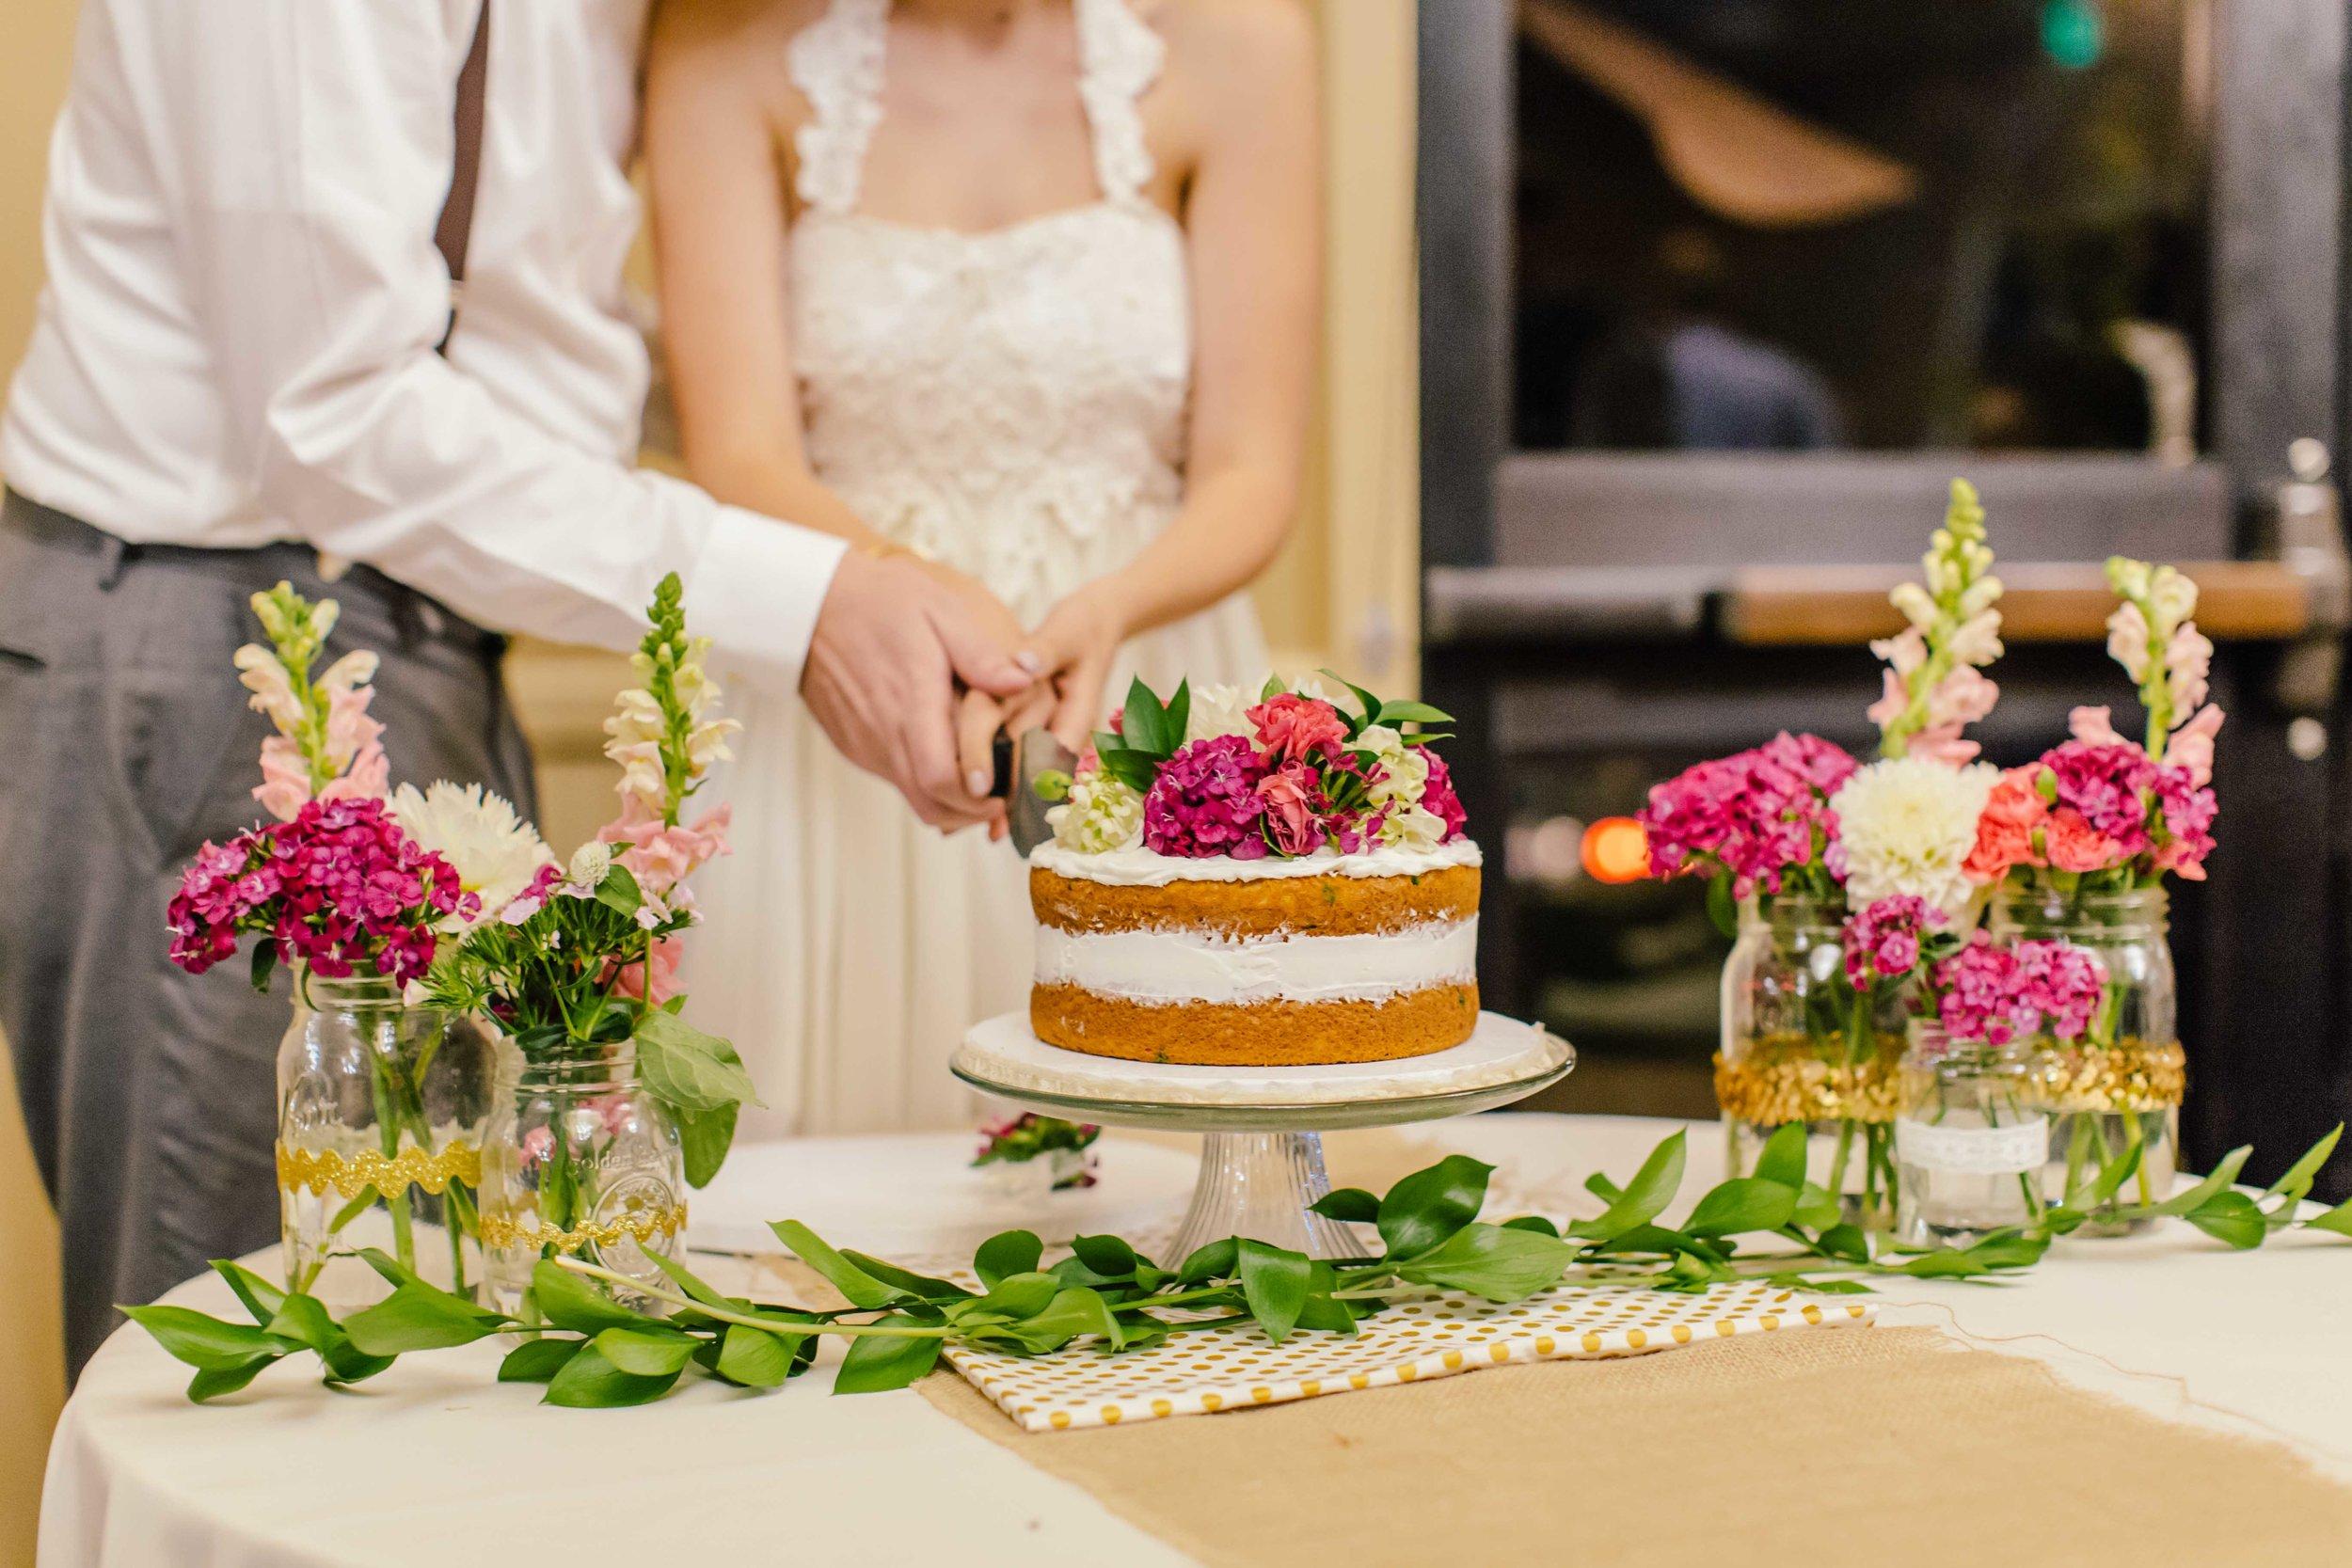 20141024-DePartee-Wedding-APavone-060-sm.jpg